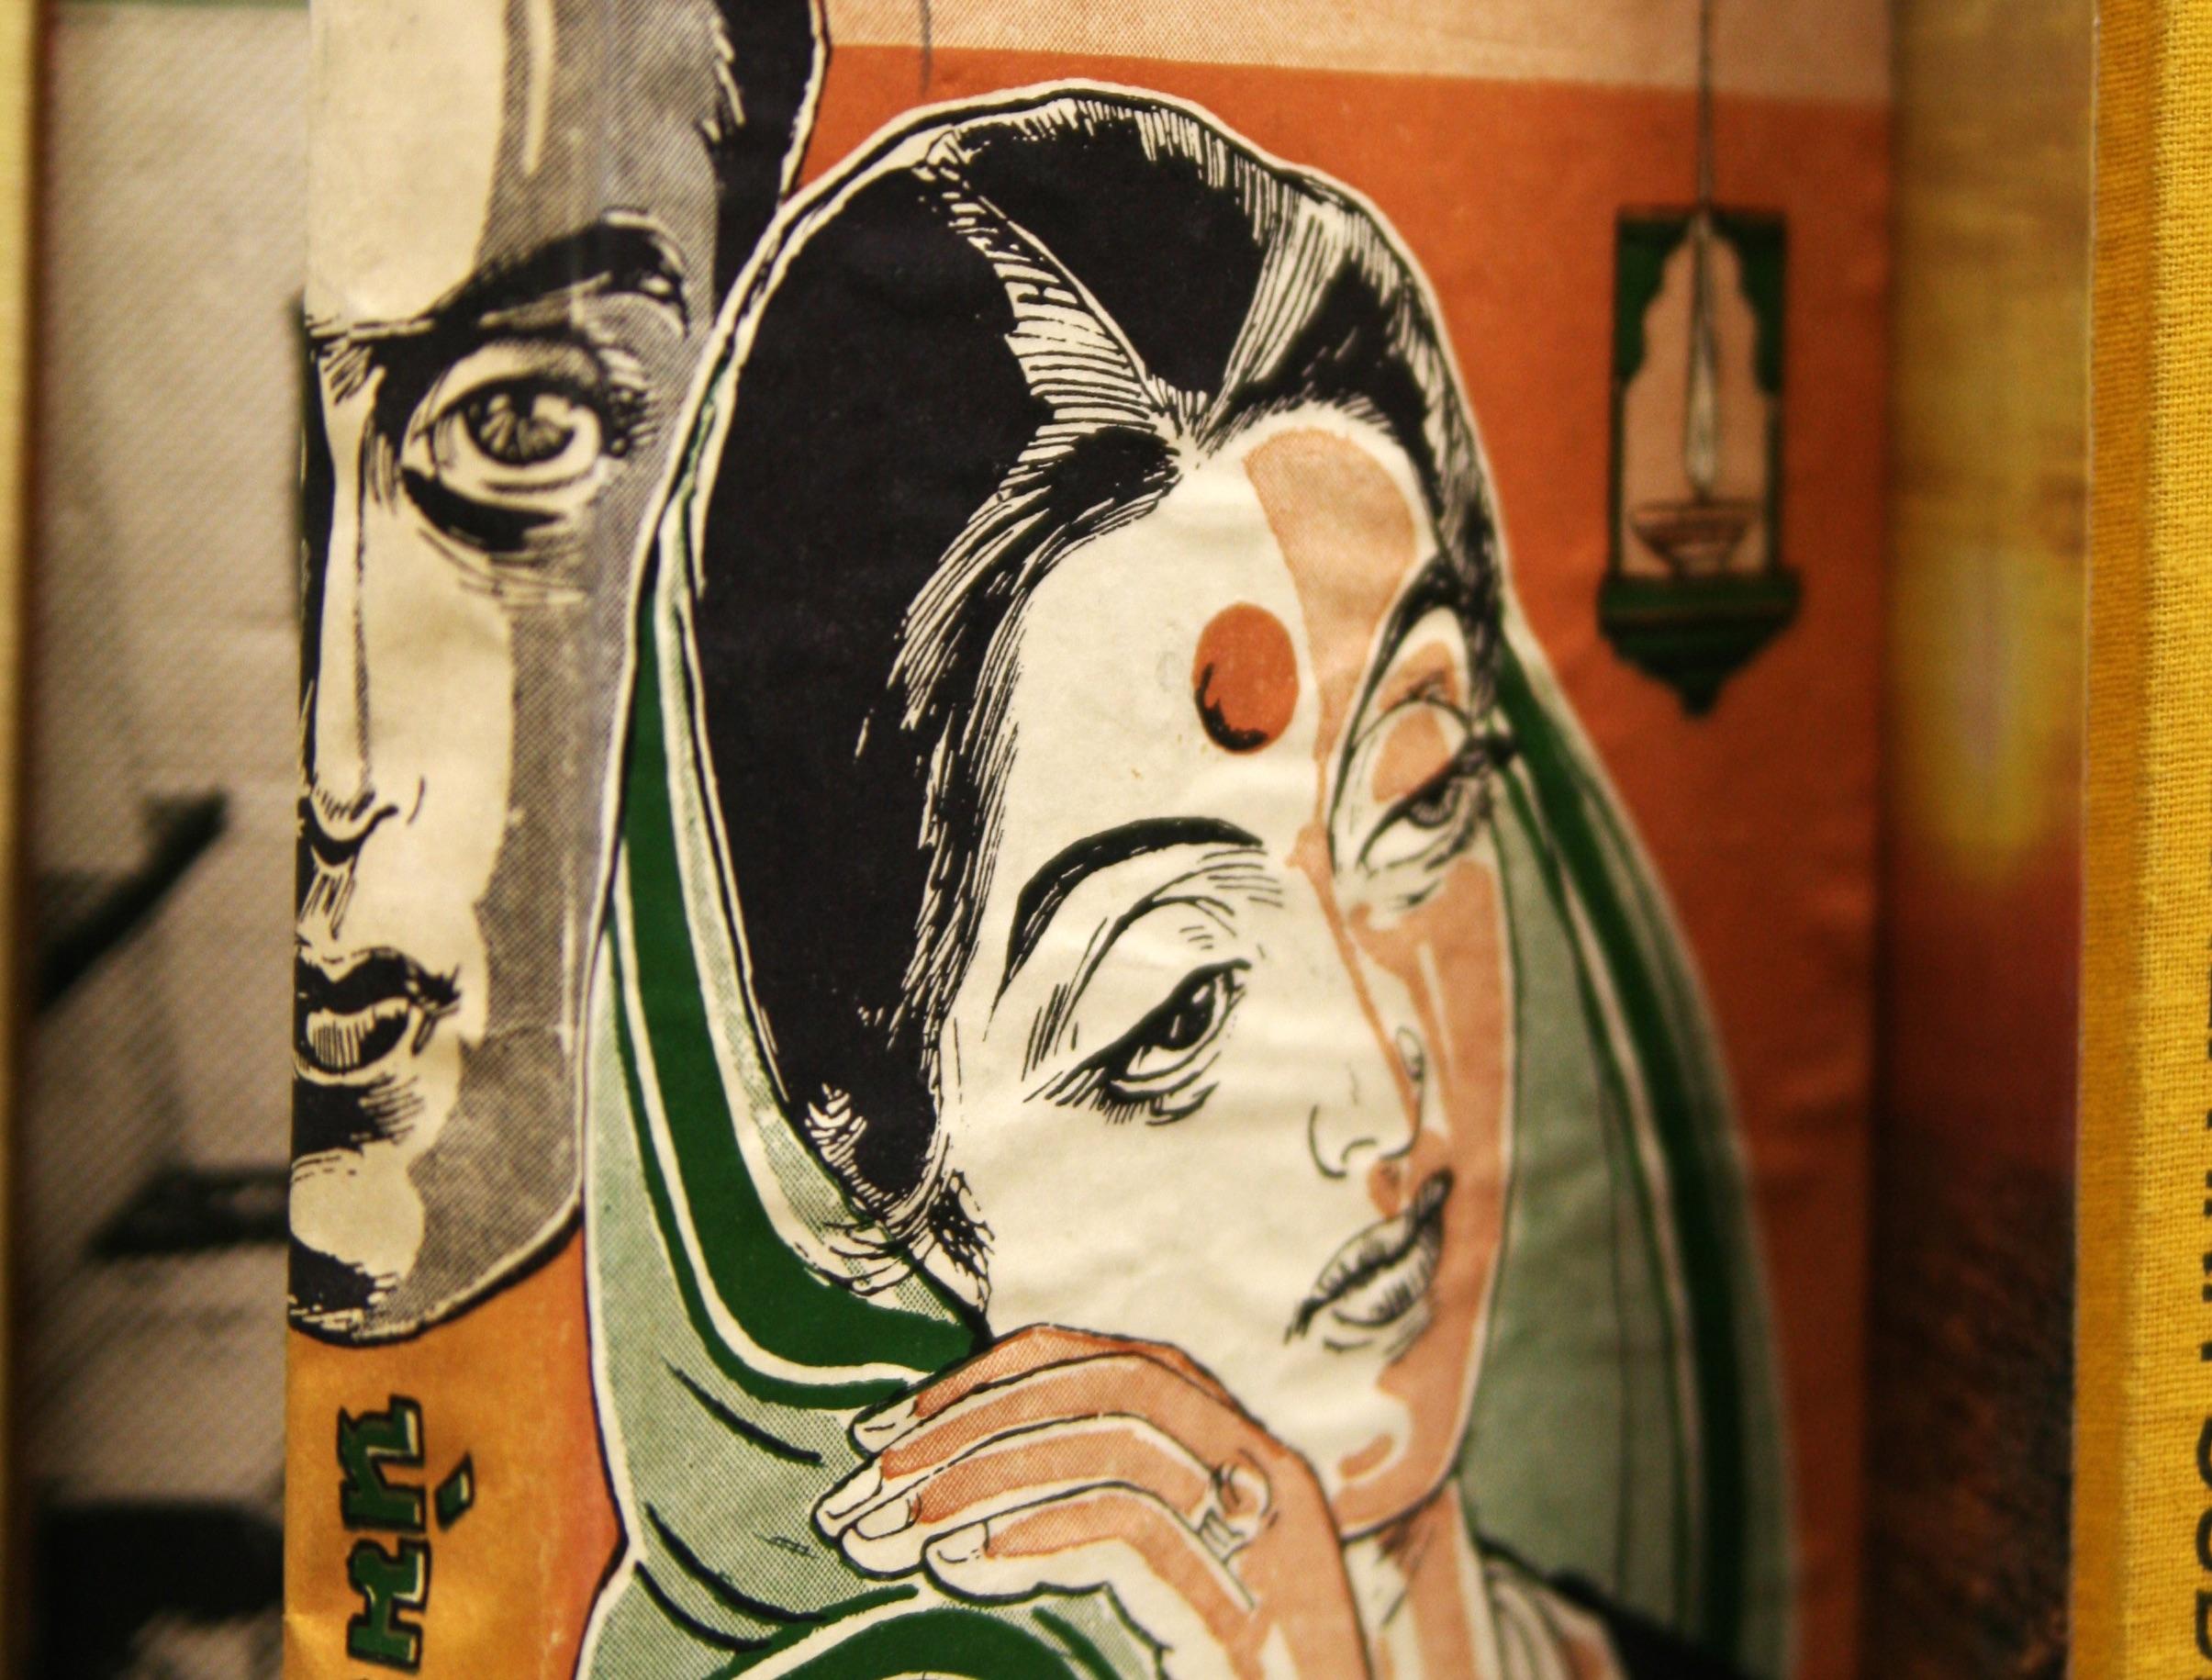 Hindu Divorce Case: Retrograde Gender Politics on the Bench